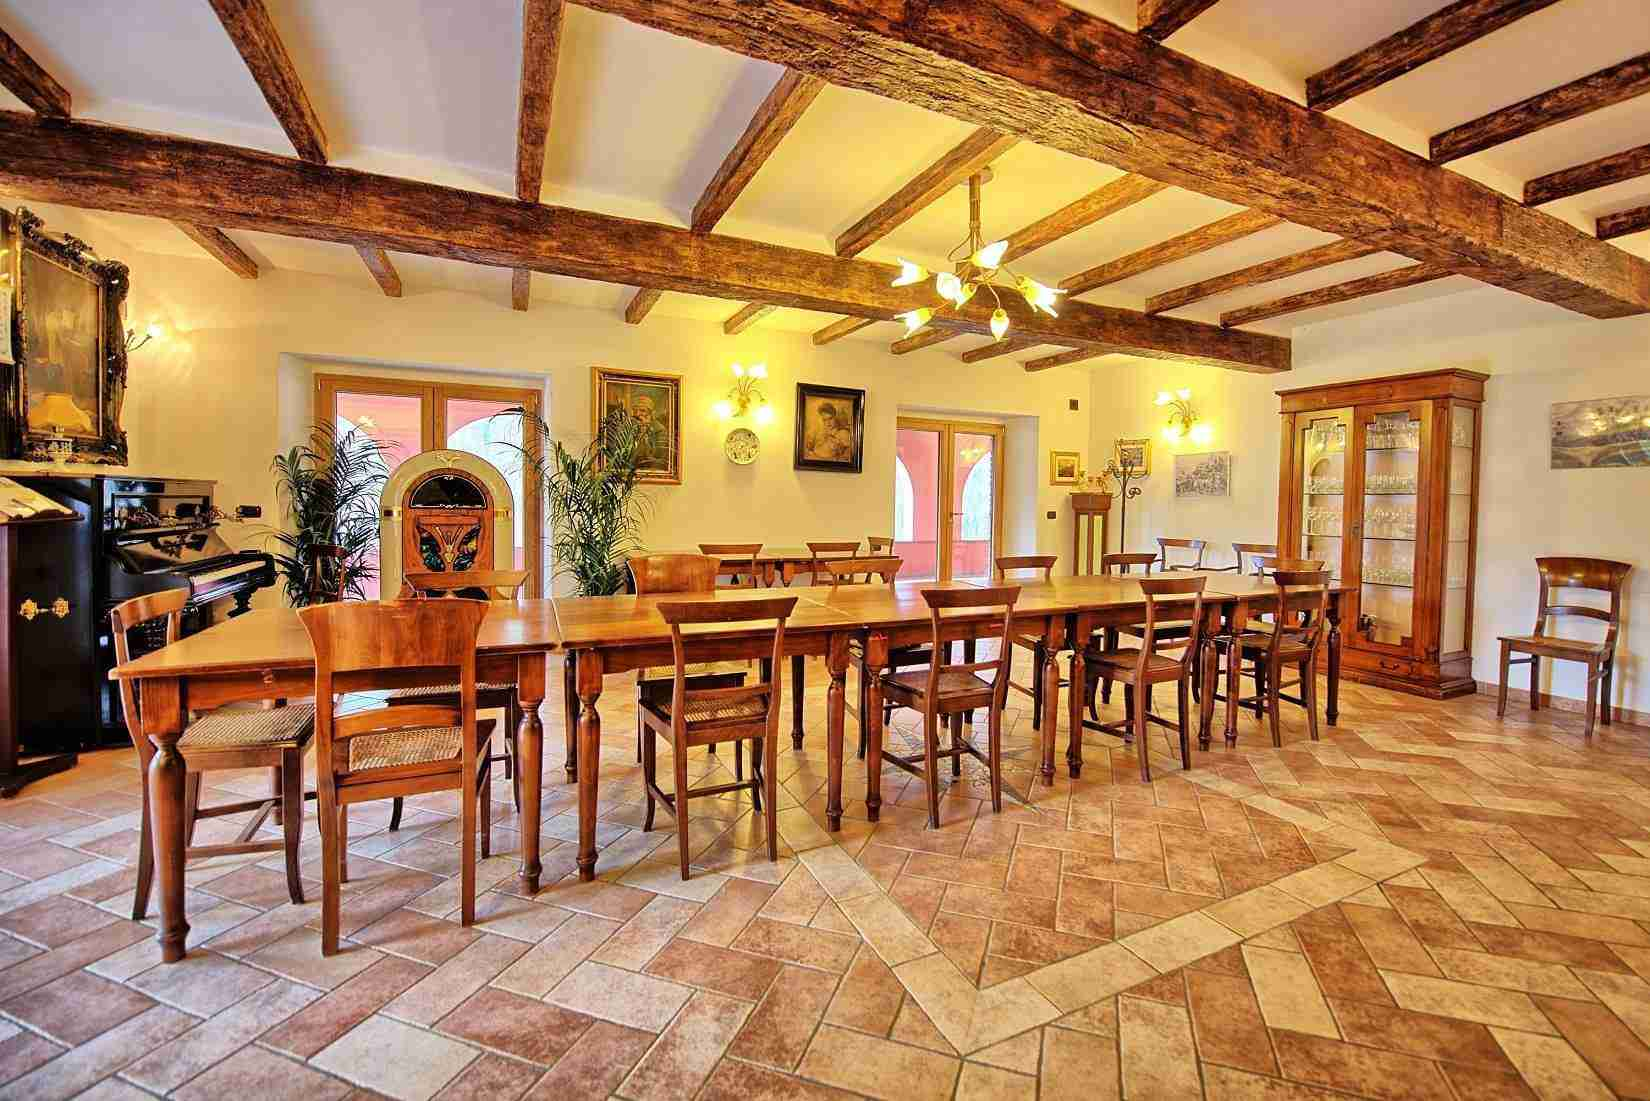 32 Etruria dining room